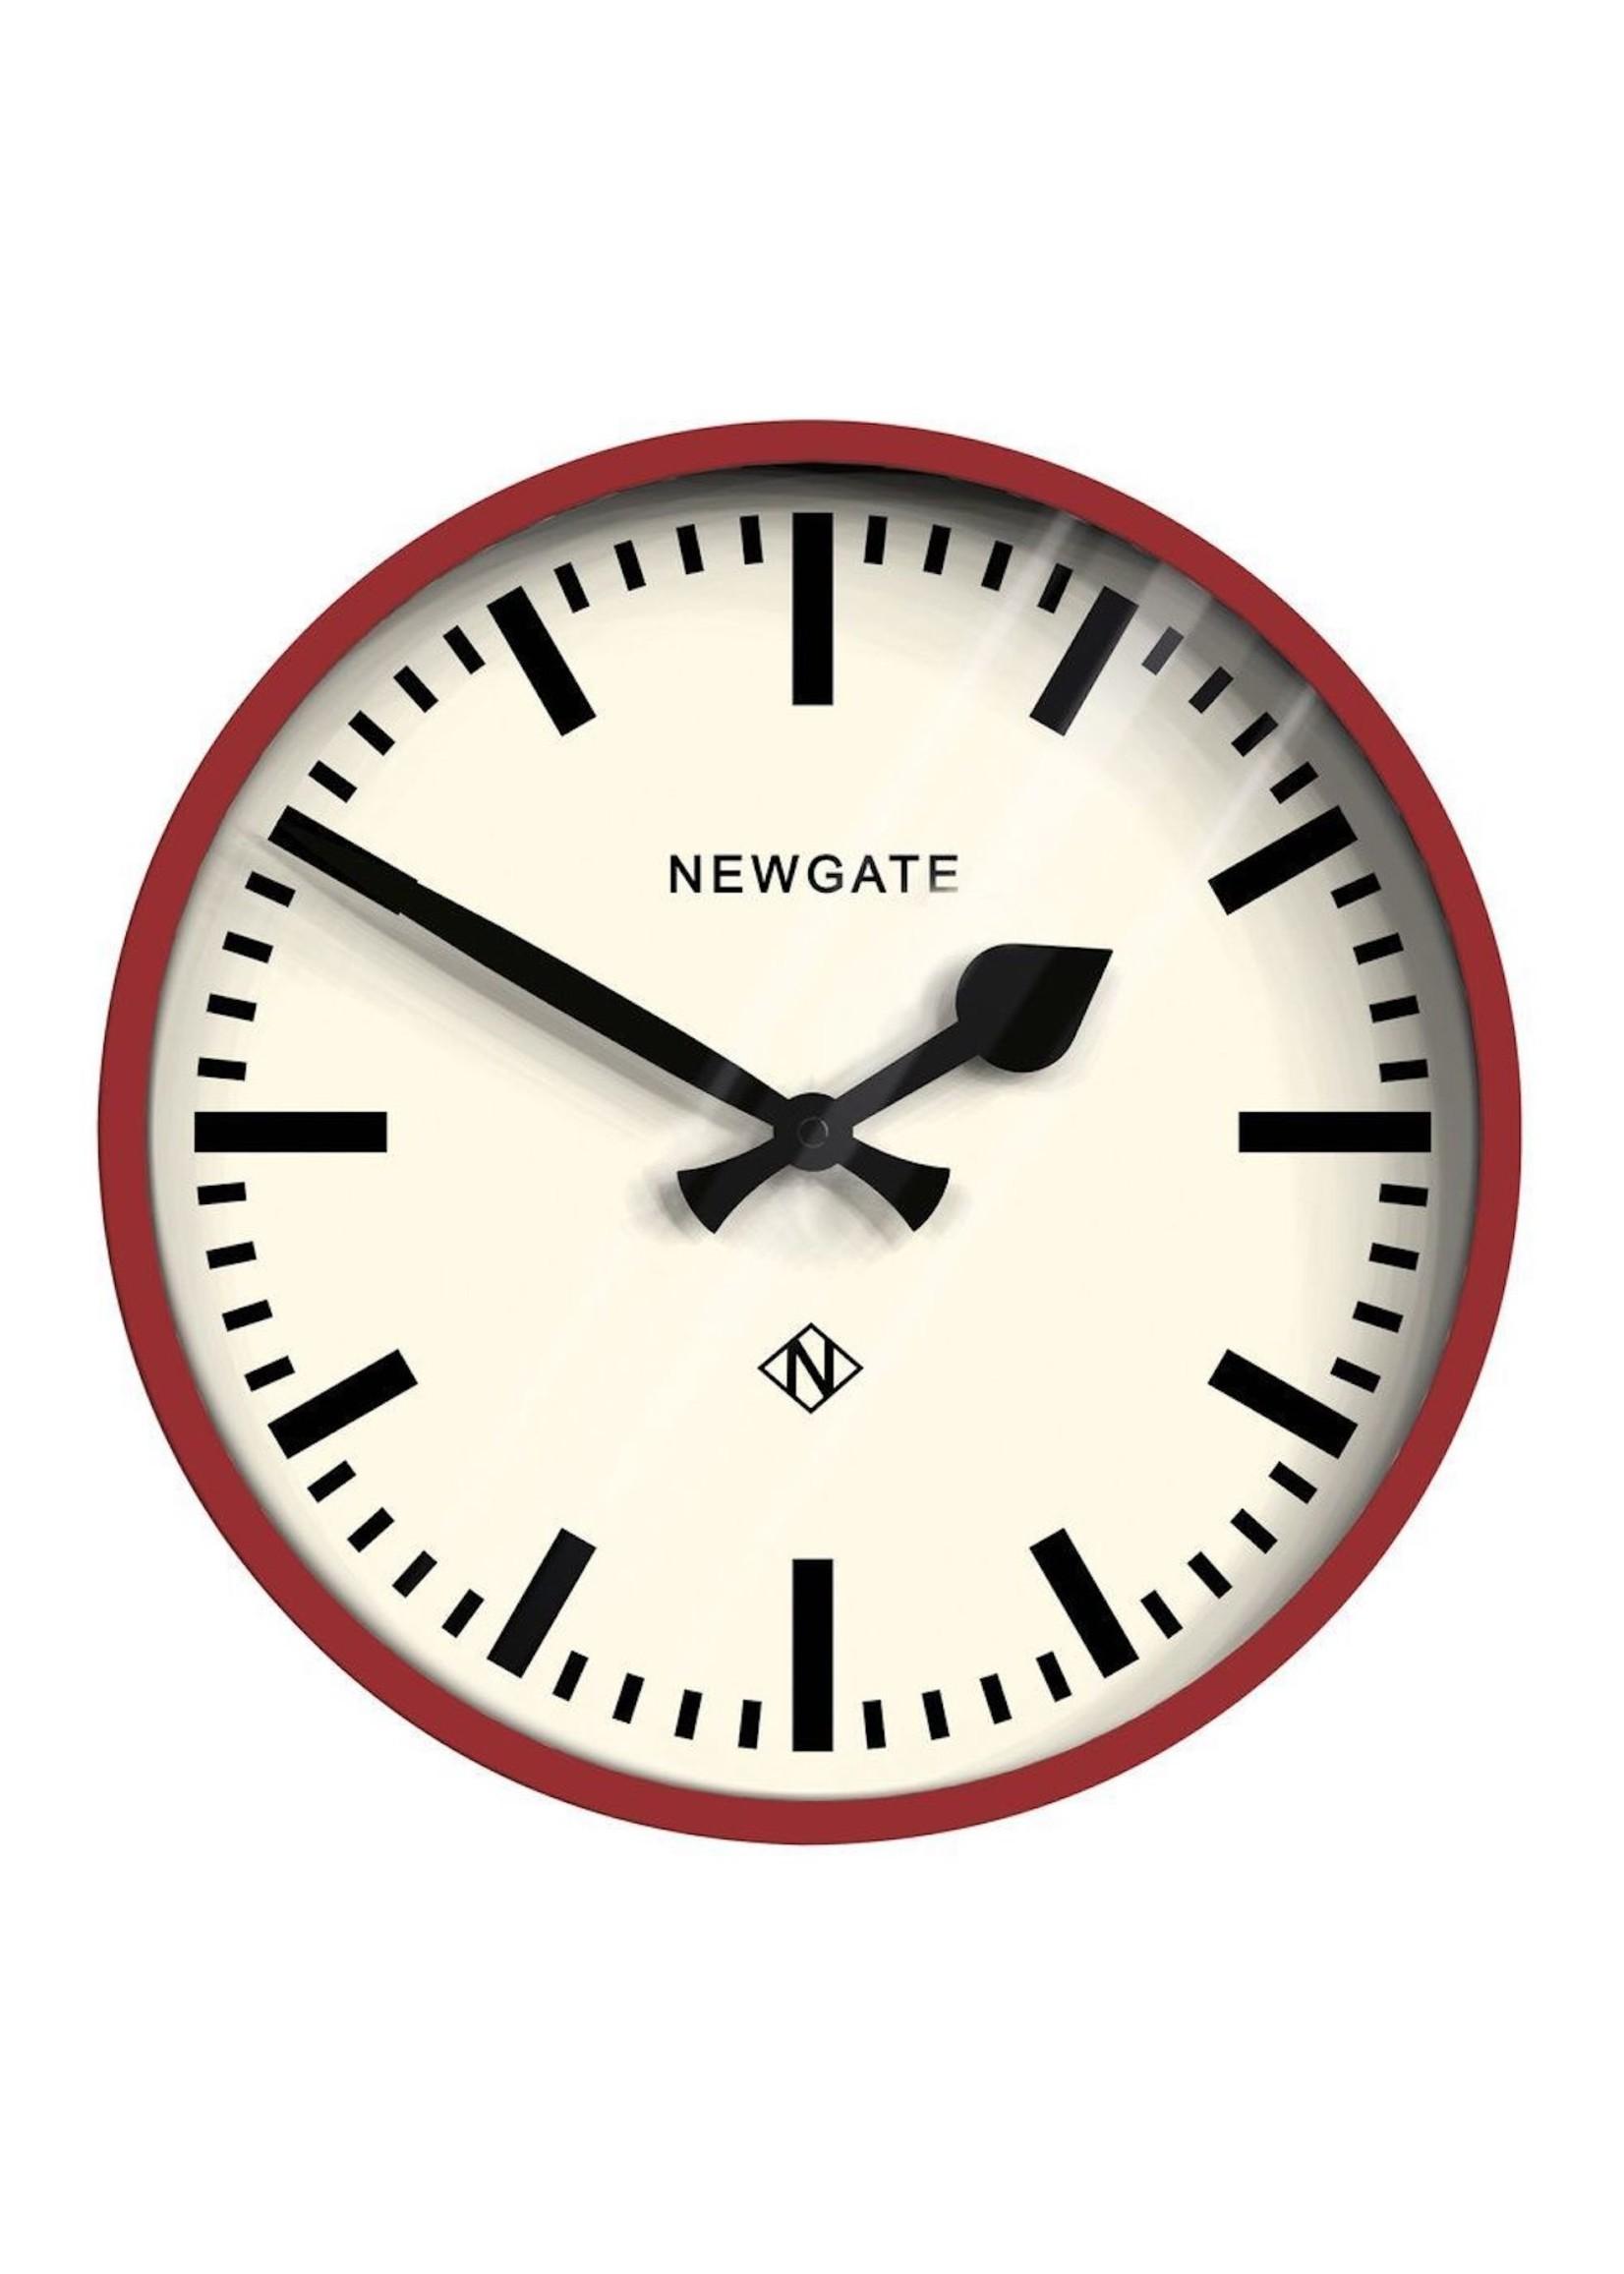 Newgate Newgate The Luggage Wall Clock